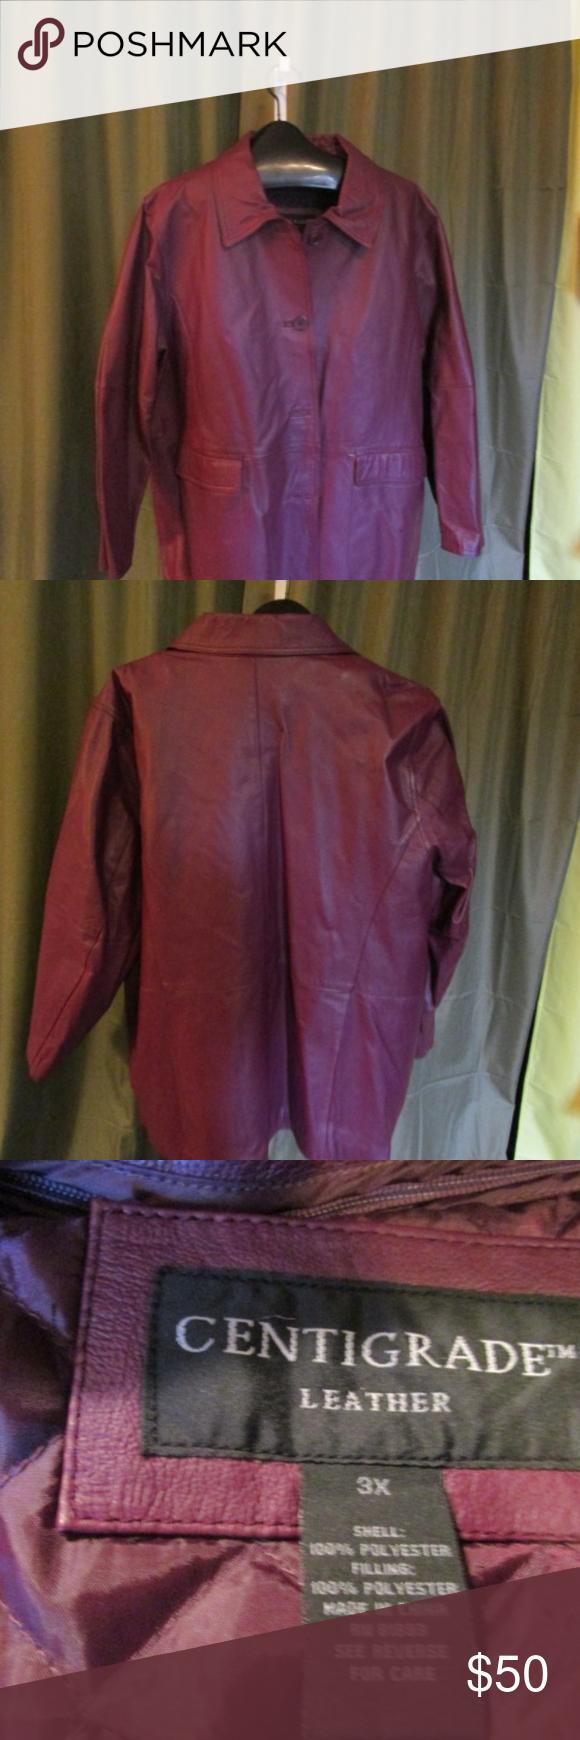 Centigrade Men S Leather Coat Mens Leather Coats Leather Coat Leather Men [ 1740 x 580 Pixel ]